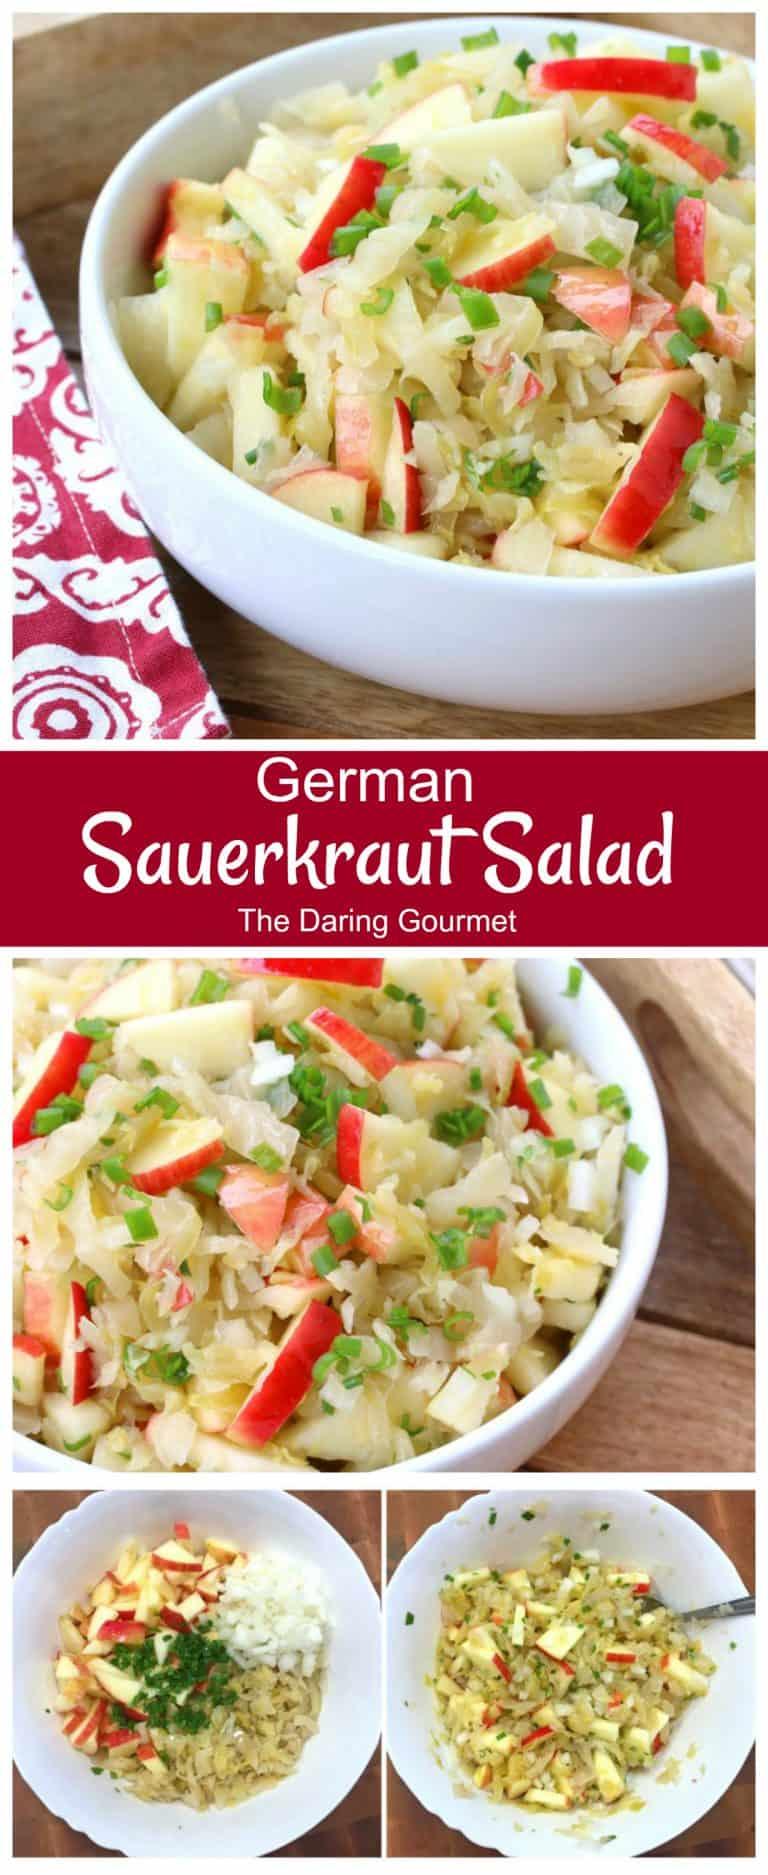 sauerkraut salad recipe german healthy apples